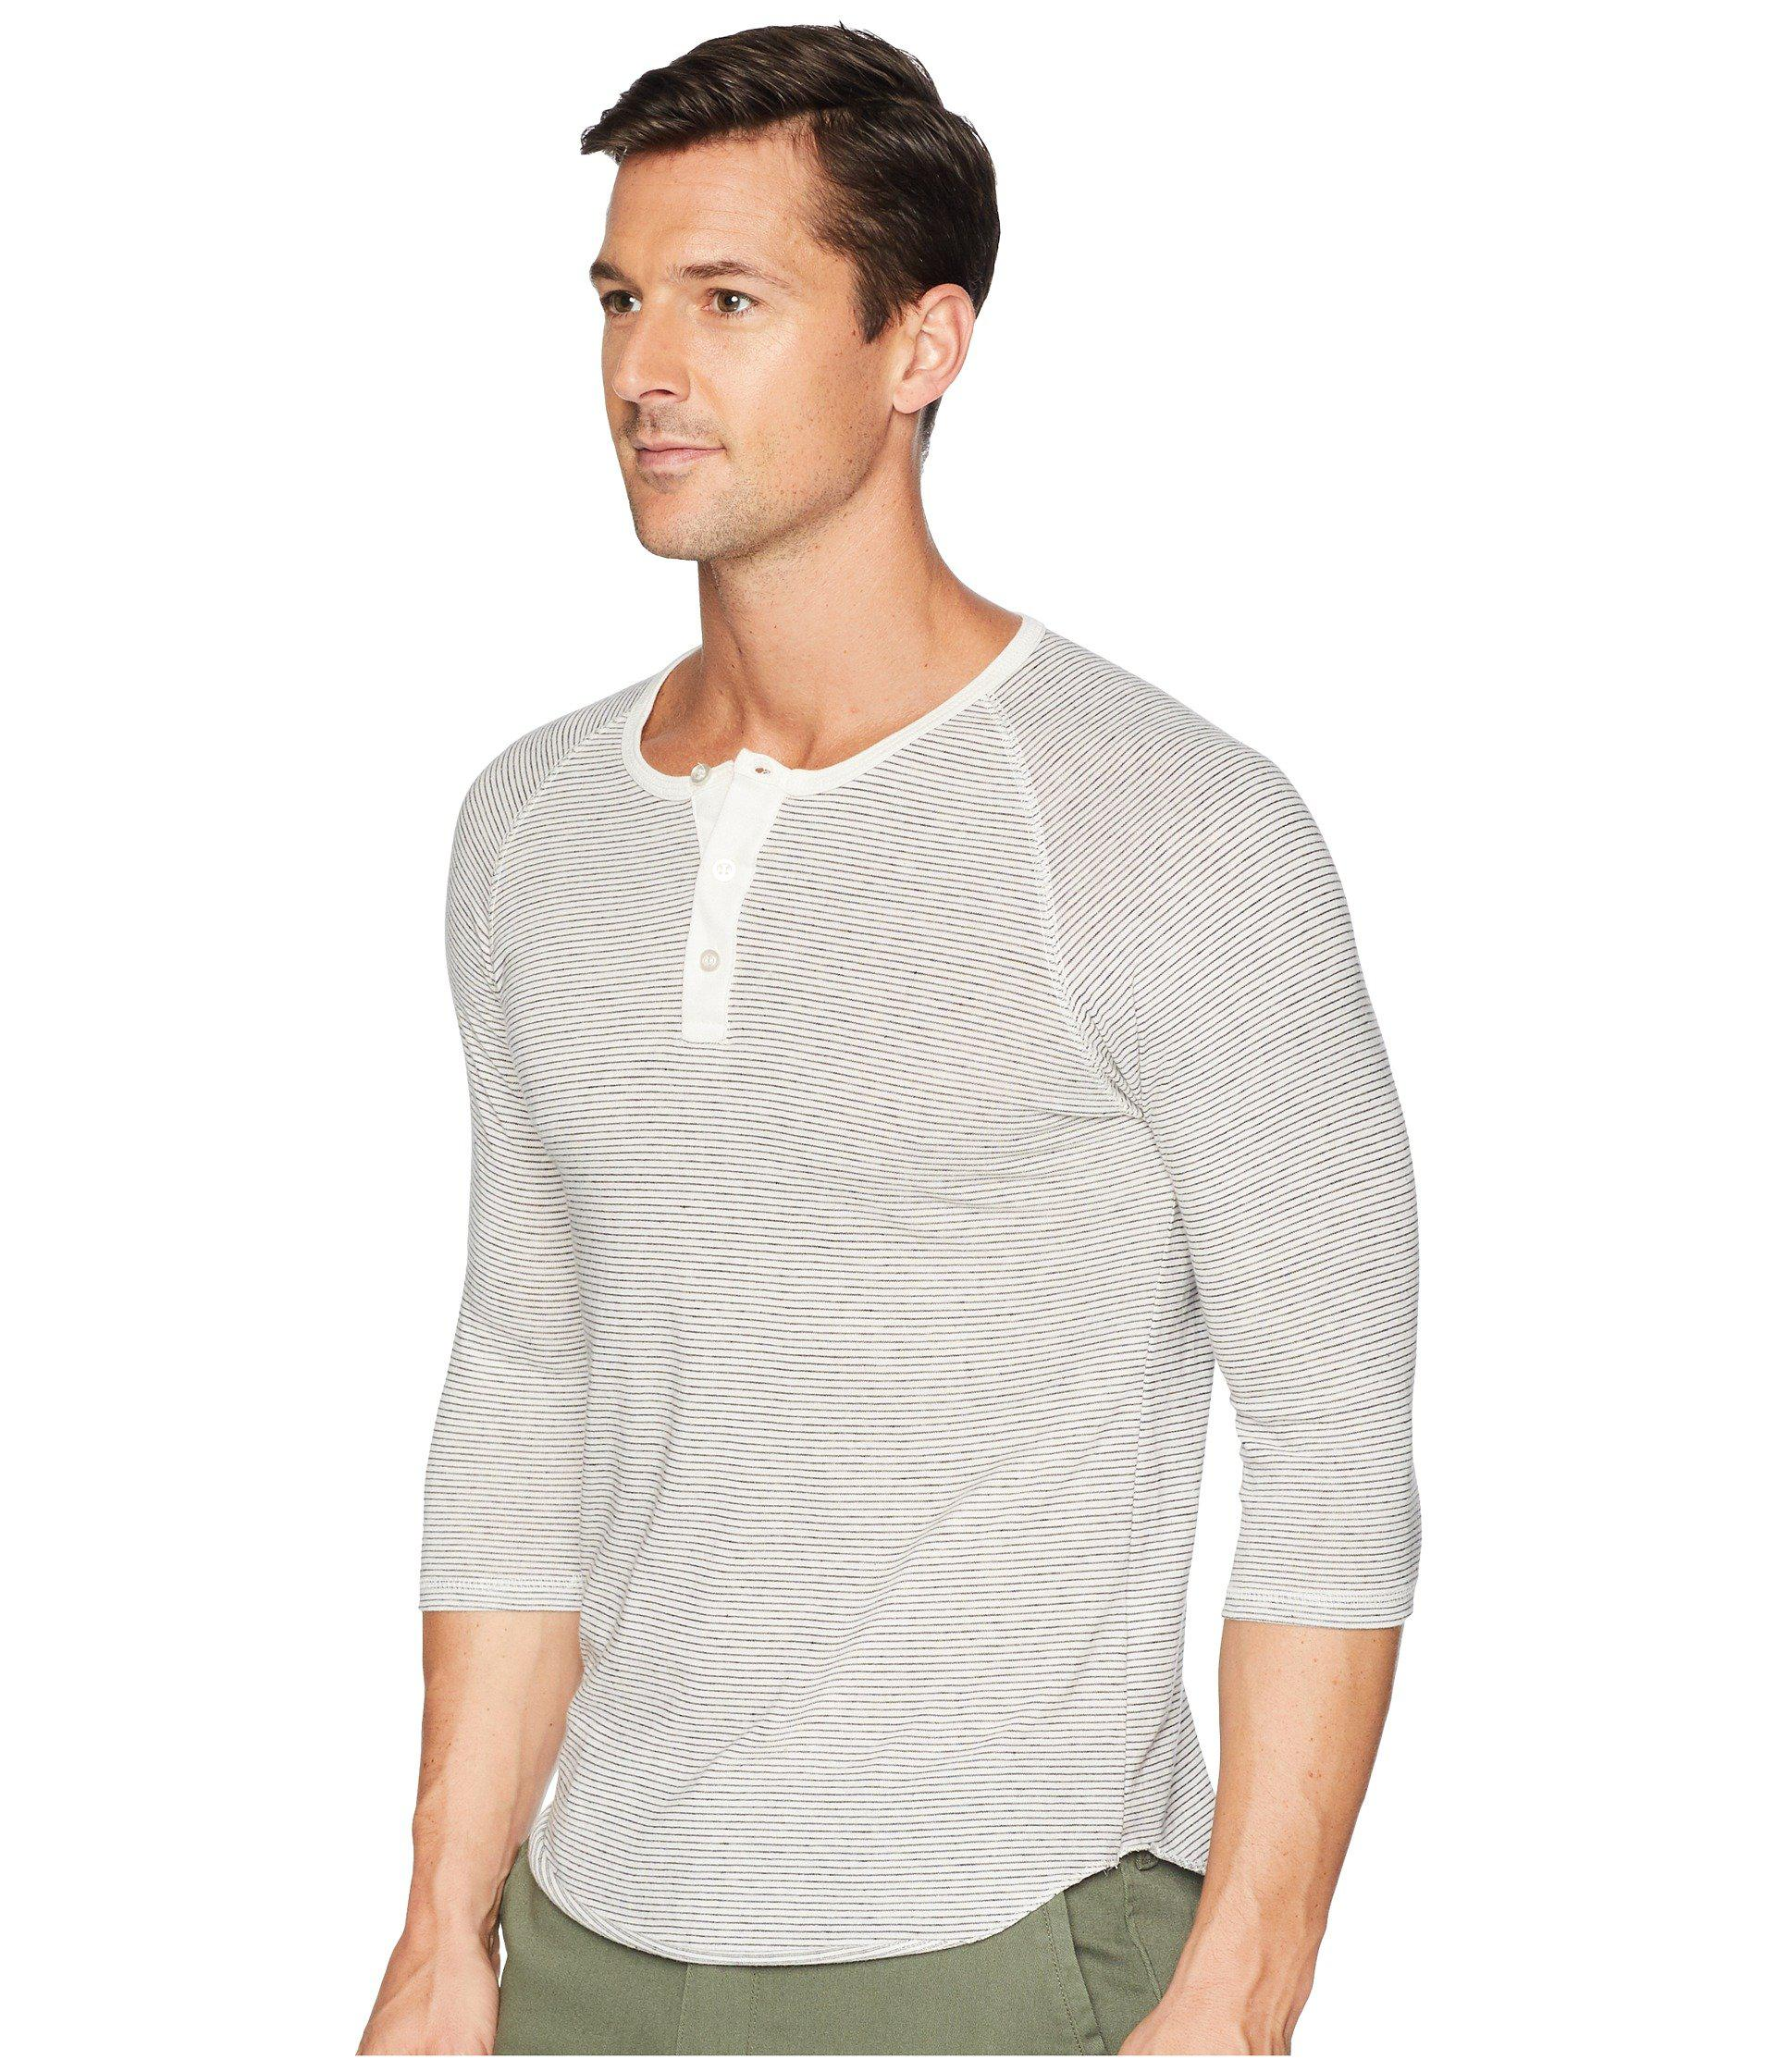 6eefced67 Alternative Apparel 3/4 Raglan Henley (eco Ivory Seaside Stripe) Men's  Clothing in White for Men - Lyst